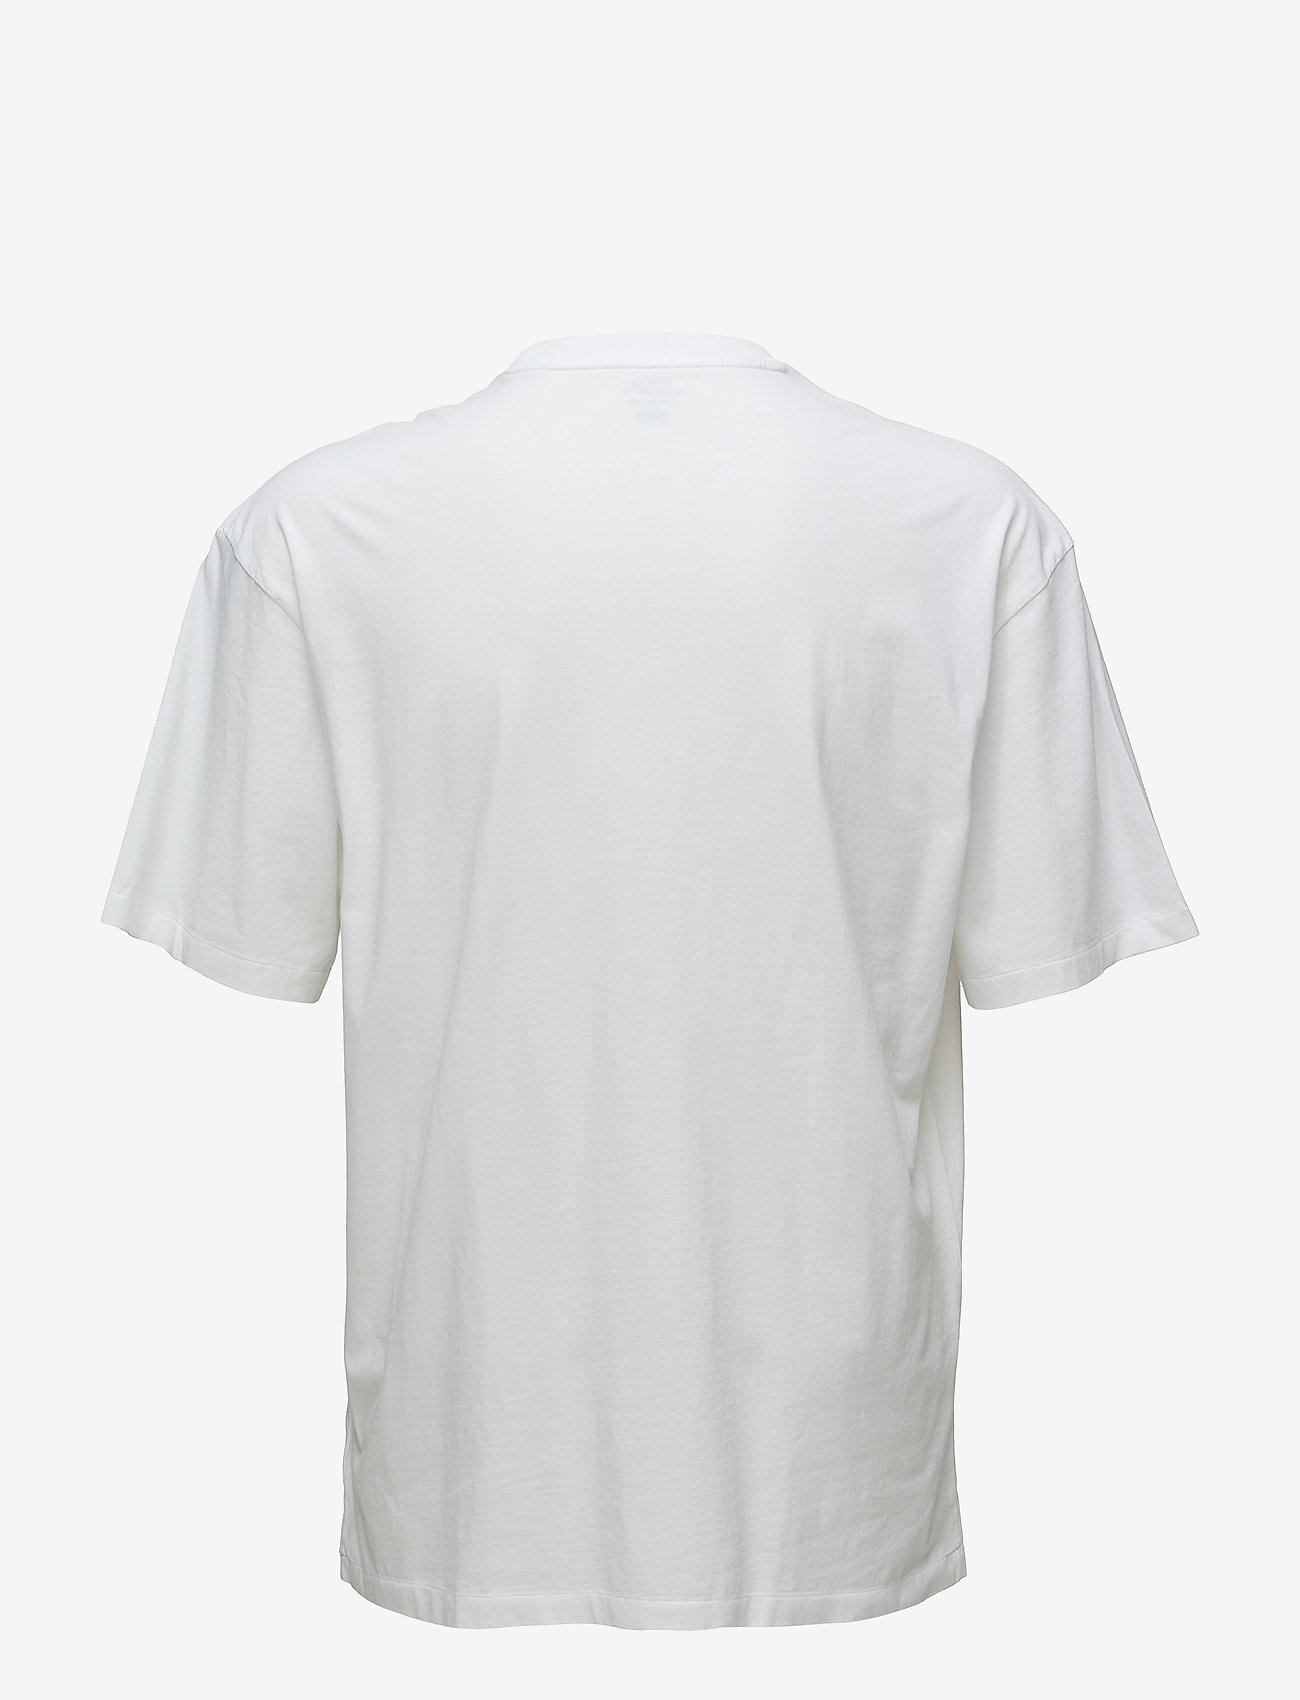 Polo Ralph Lauren Big & Tall - Classic Fit Pocket T-Shirt - kortärmade t-shirts - white - 1